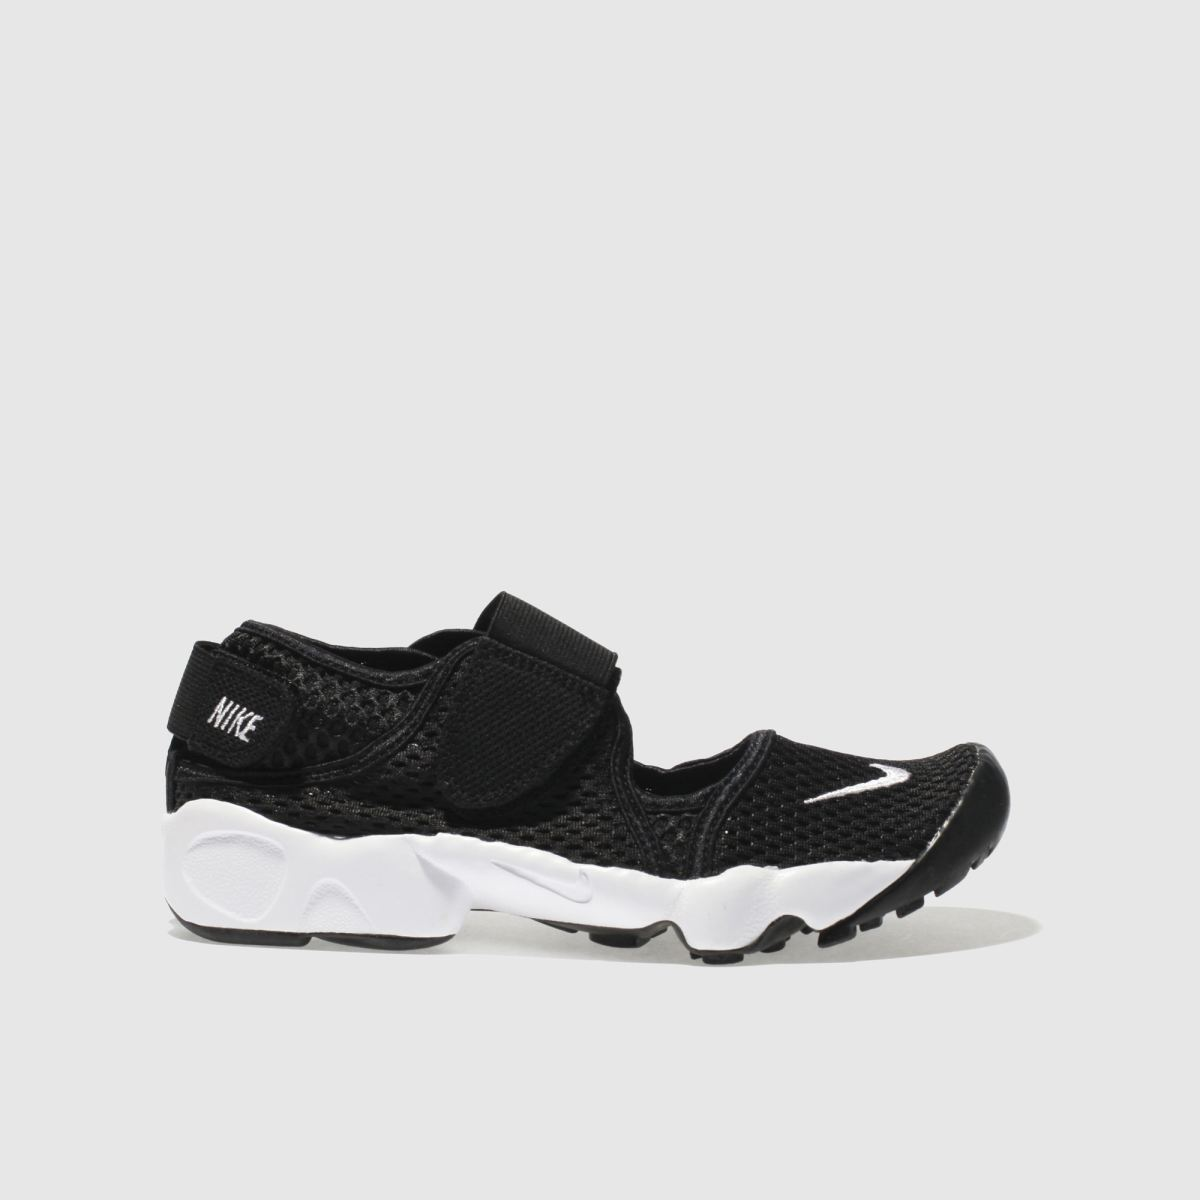 Nike Black Rift Trainers Youth